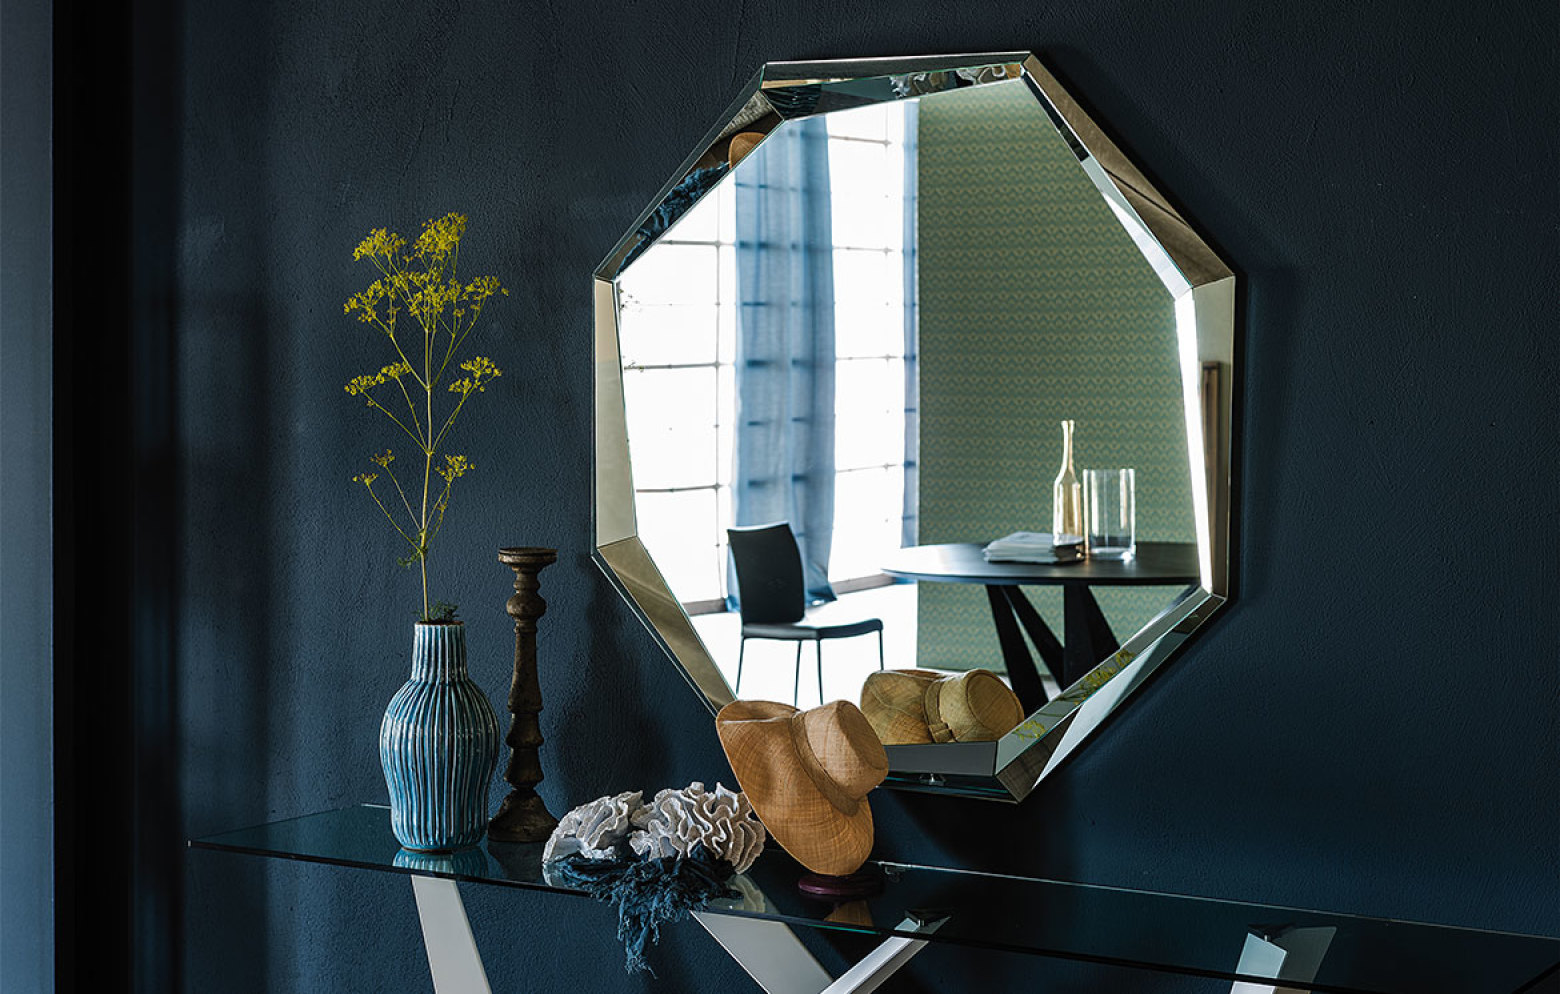 Emerald spiegel kleinm bel accessoires who 39 s perfect for Specchi arredo